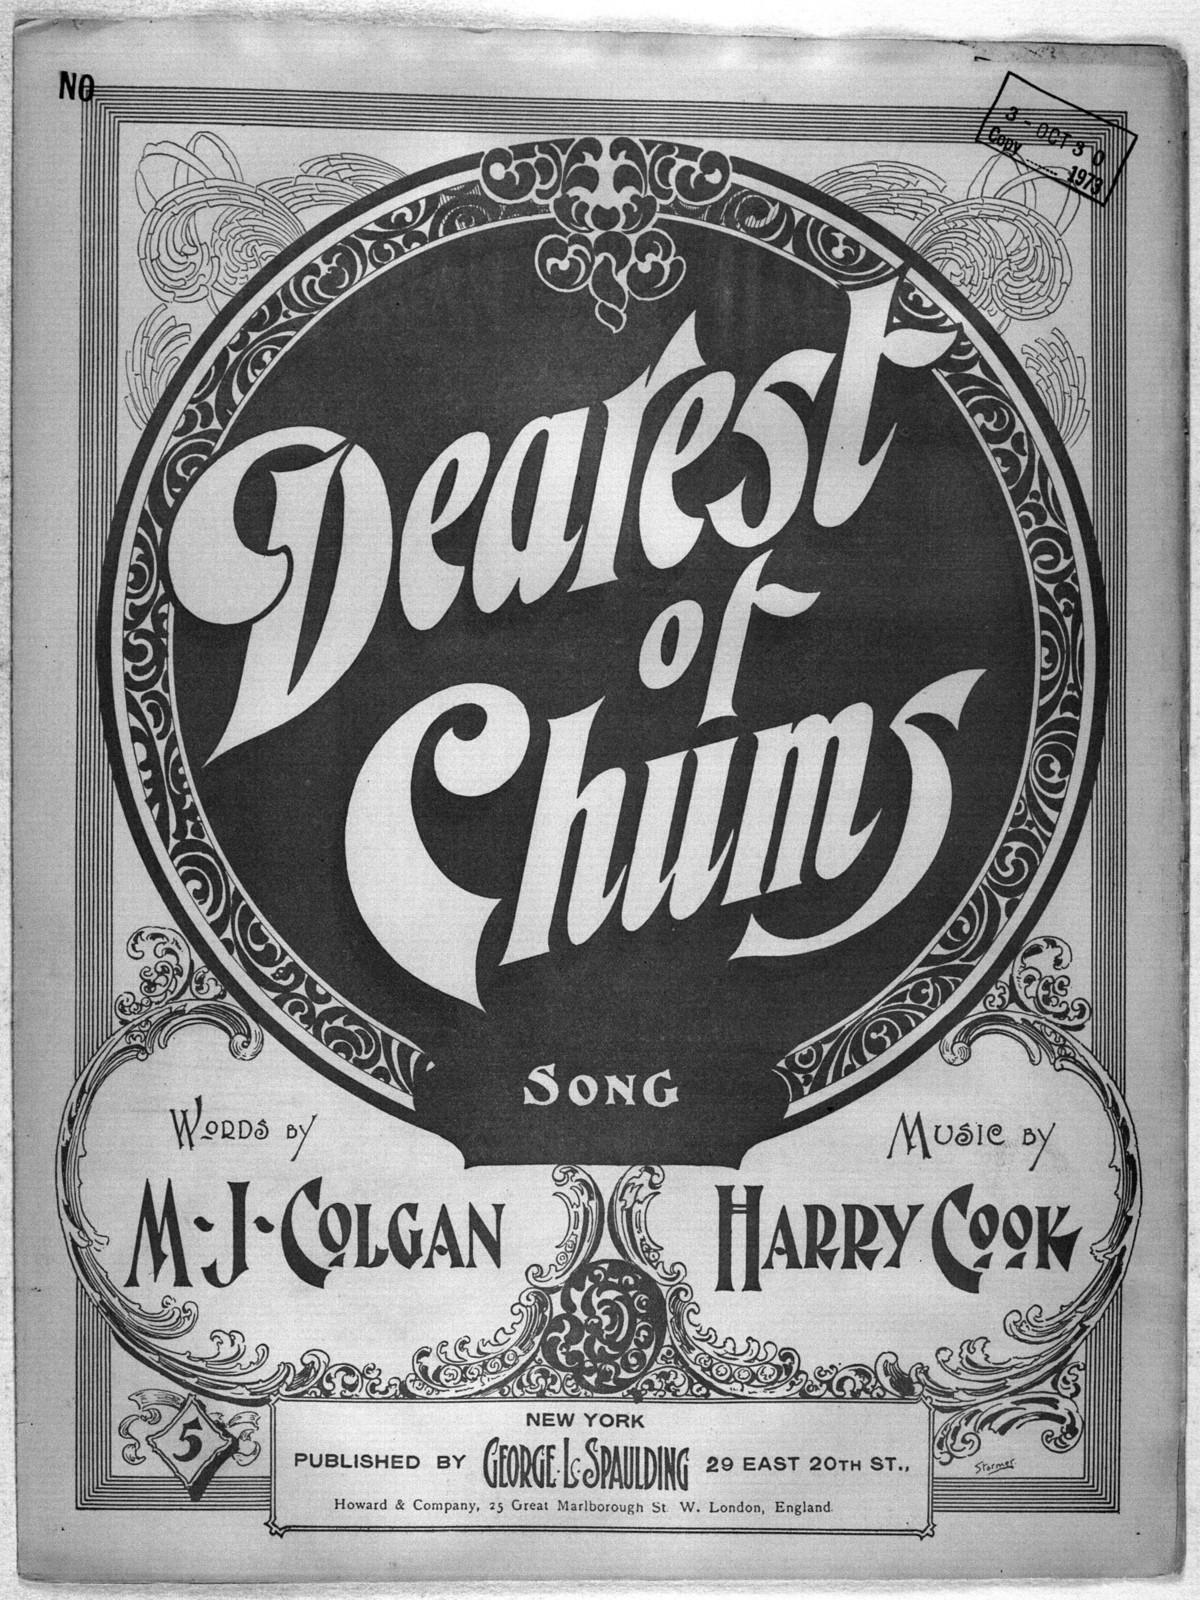 Dearest of chums